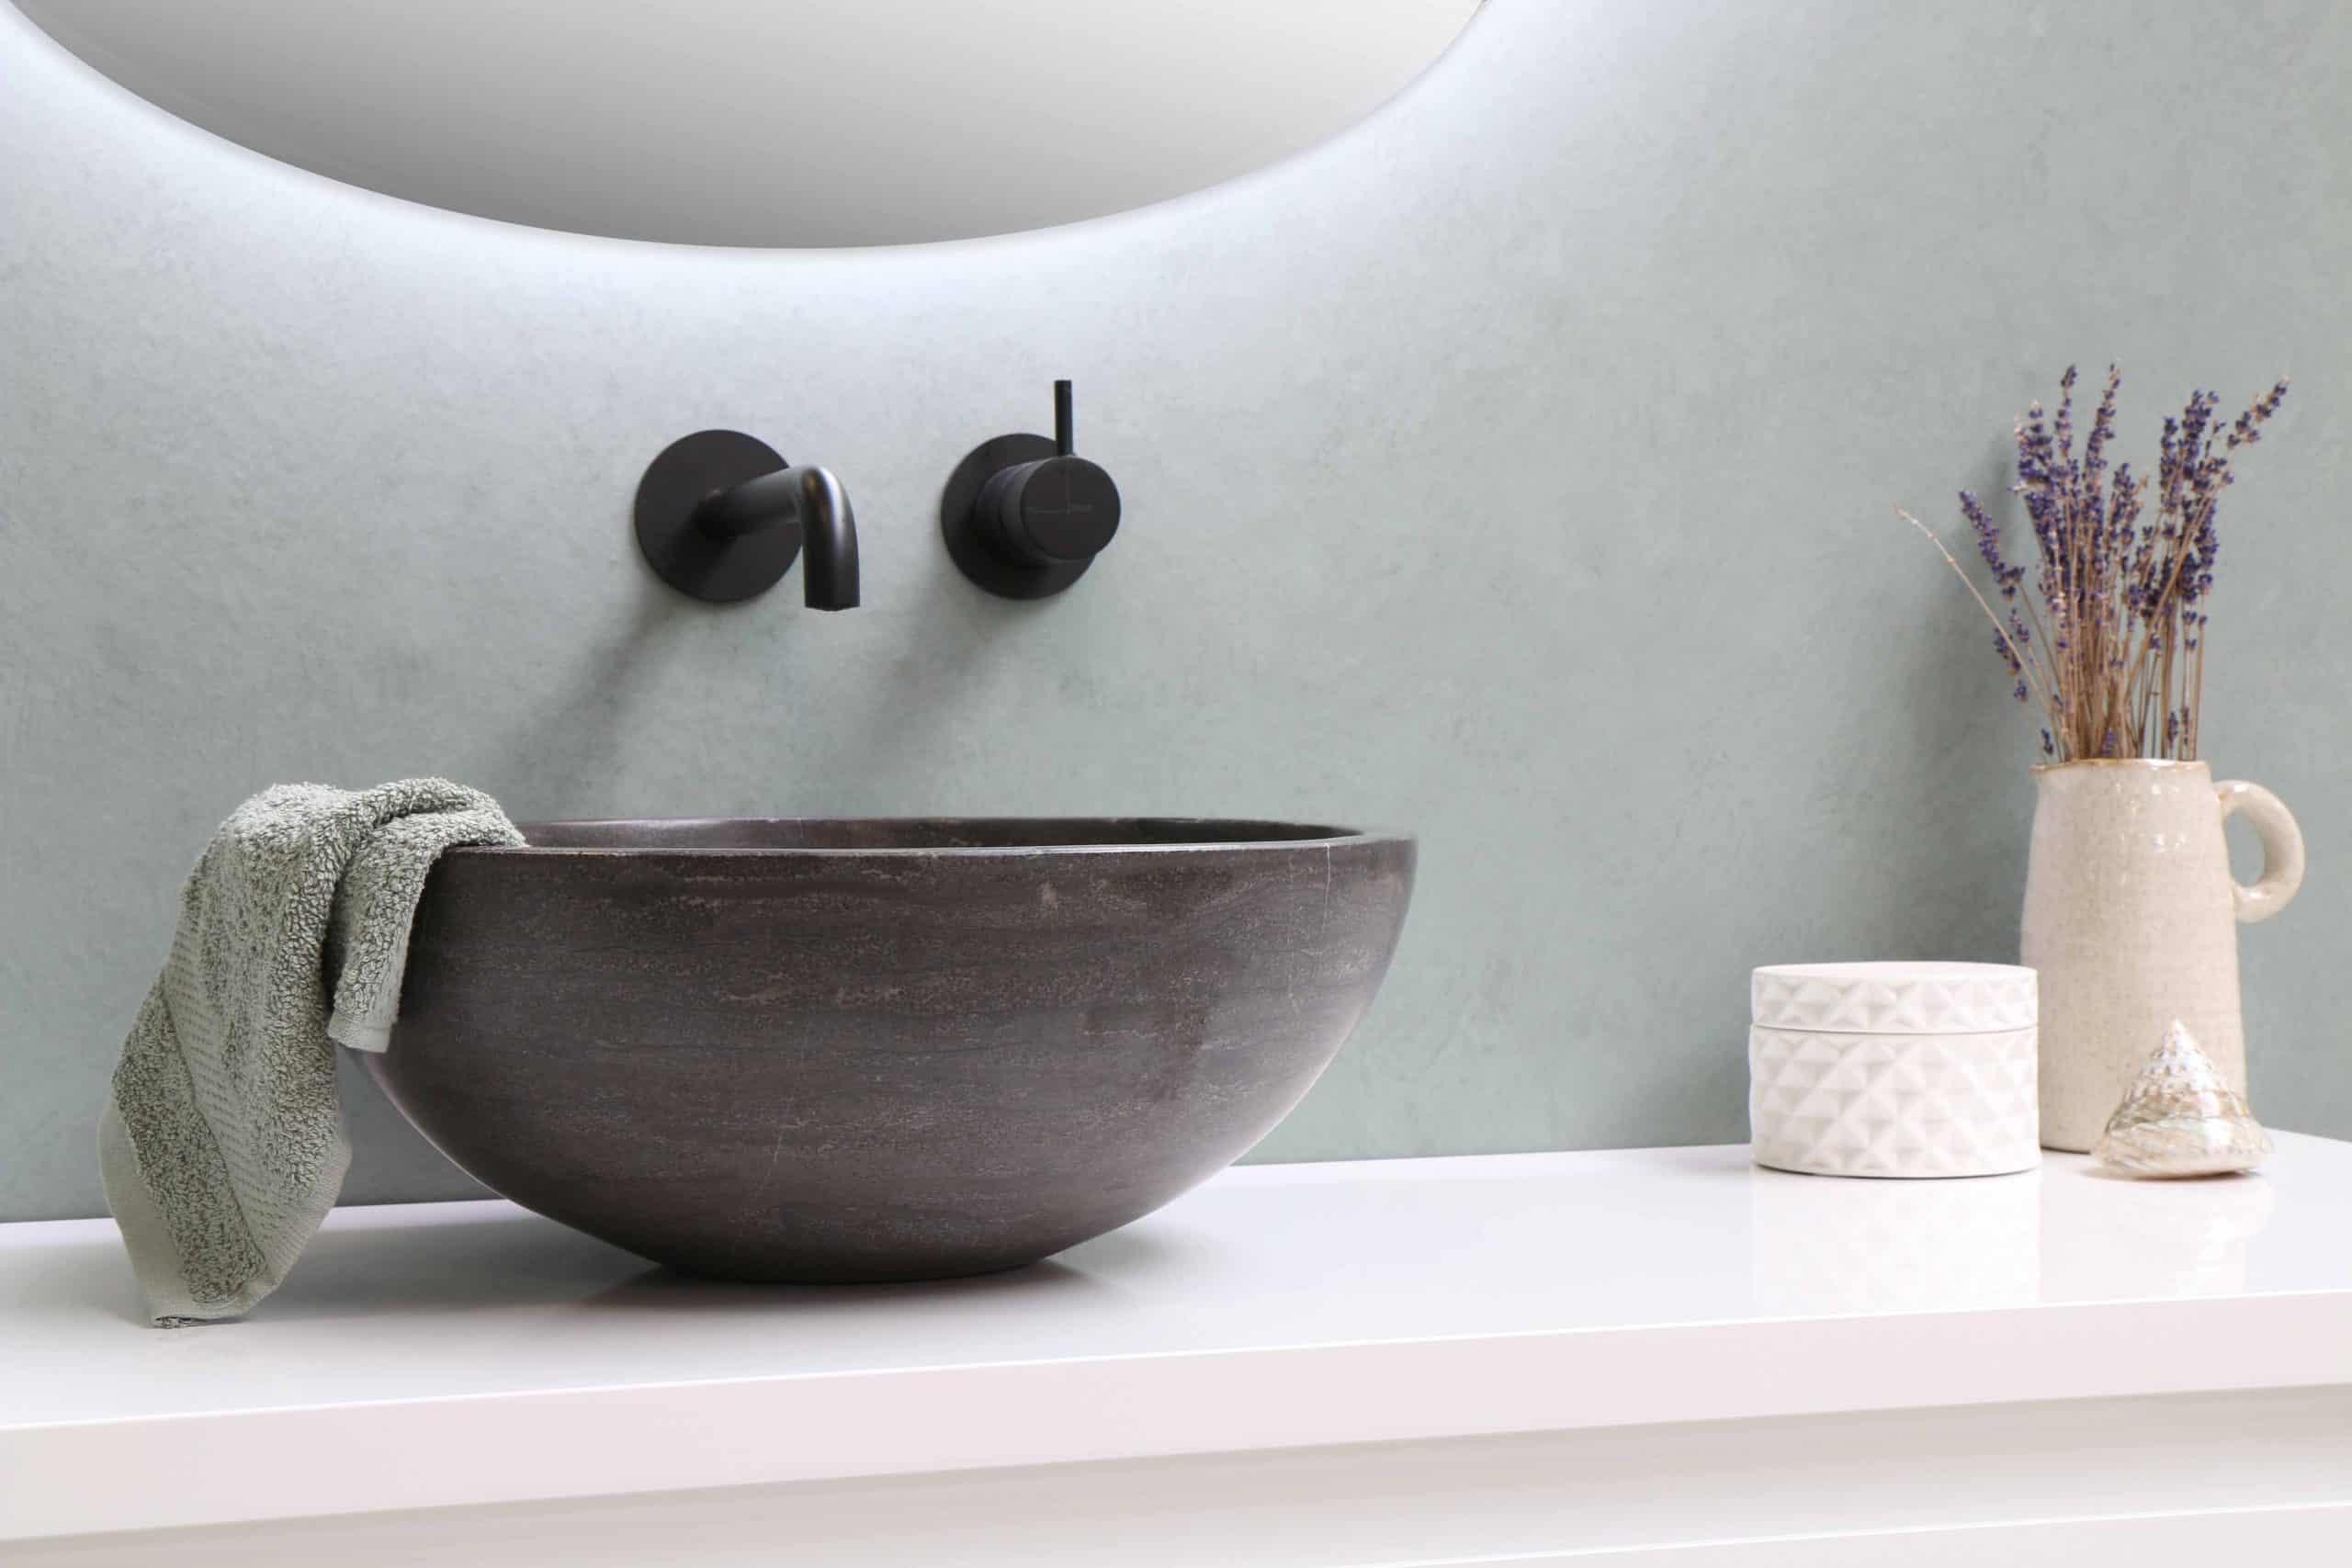 11 Unique Modern Bathroom Sinks